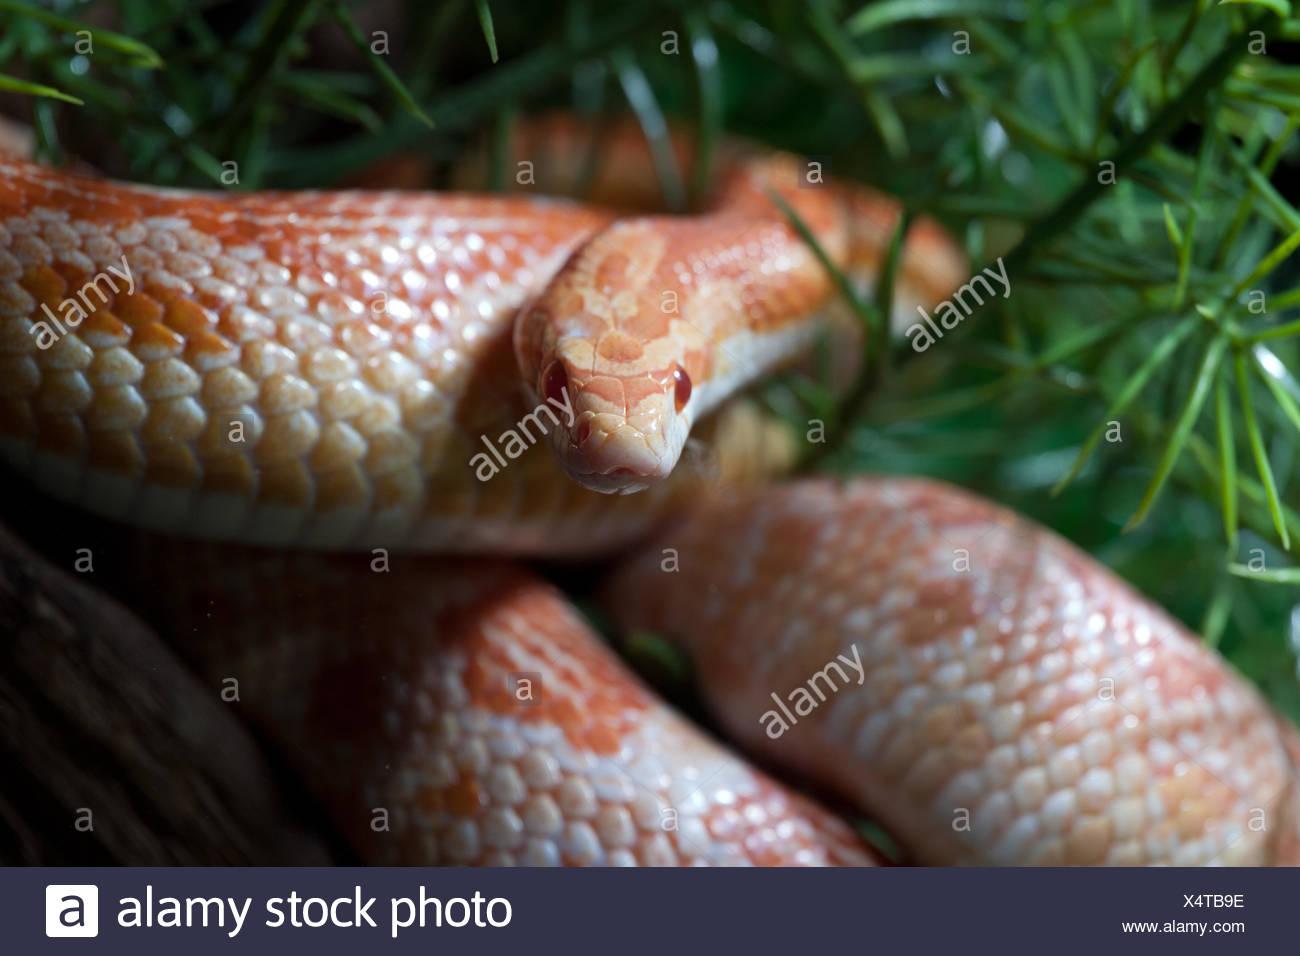 animals snake reptiles attitude design shaping formation shape model